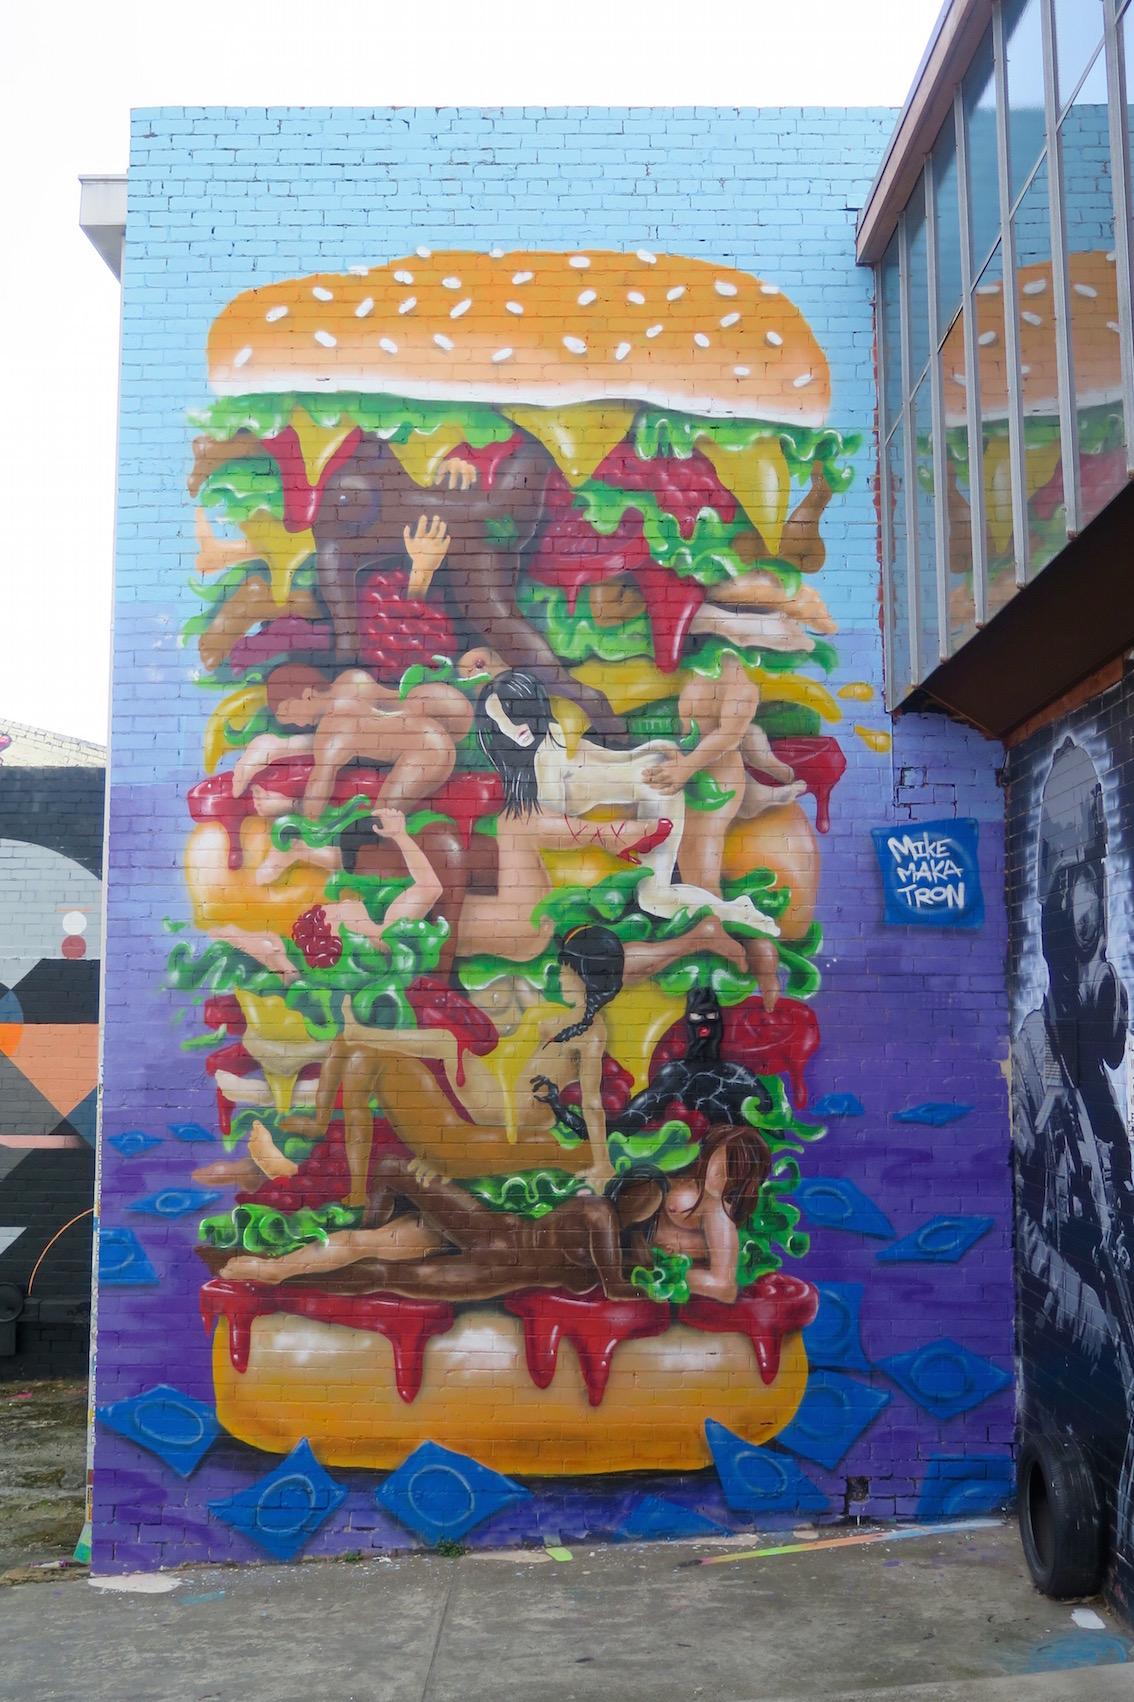 deansunshine_landofsunshine_melbourne_streetart_graffiti_Makatron kama Sutra burger 2